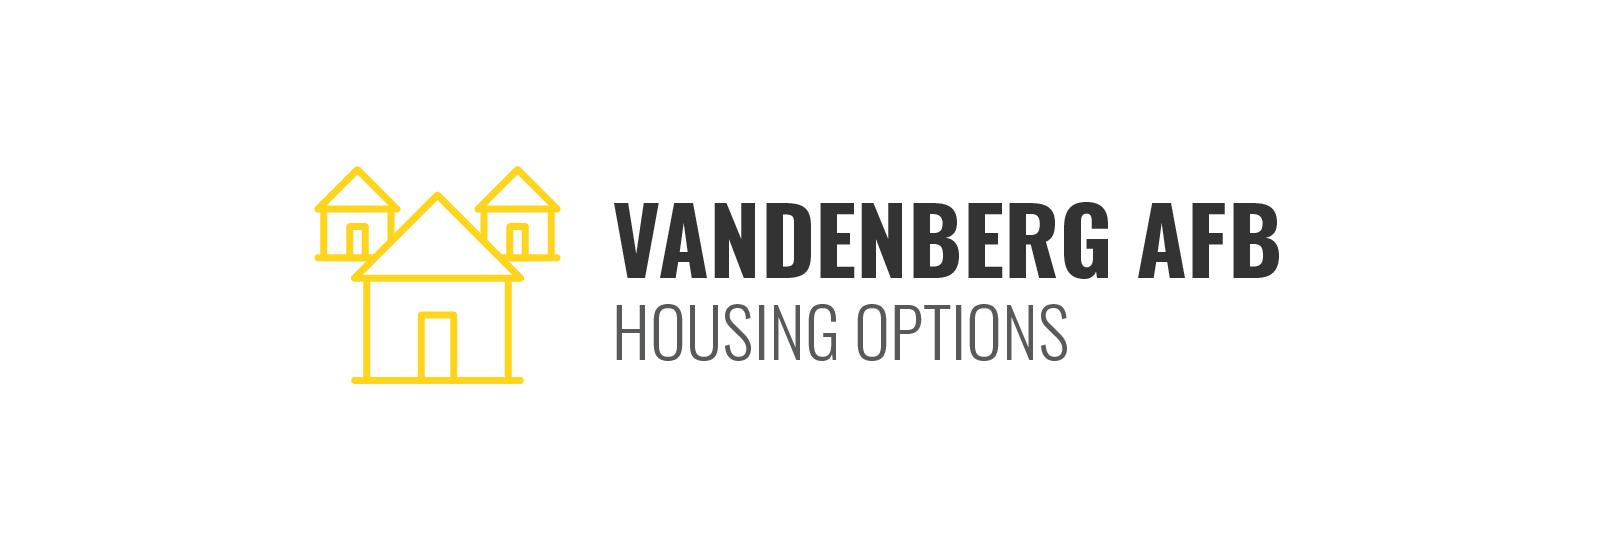 Vandenberg AFB Housing Options